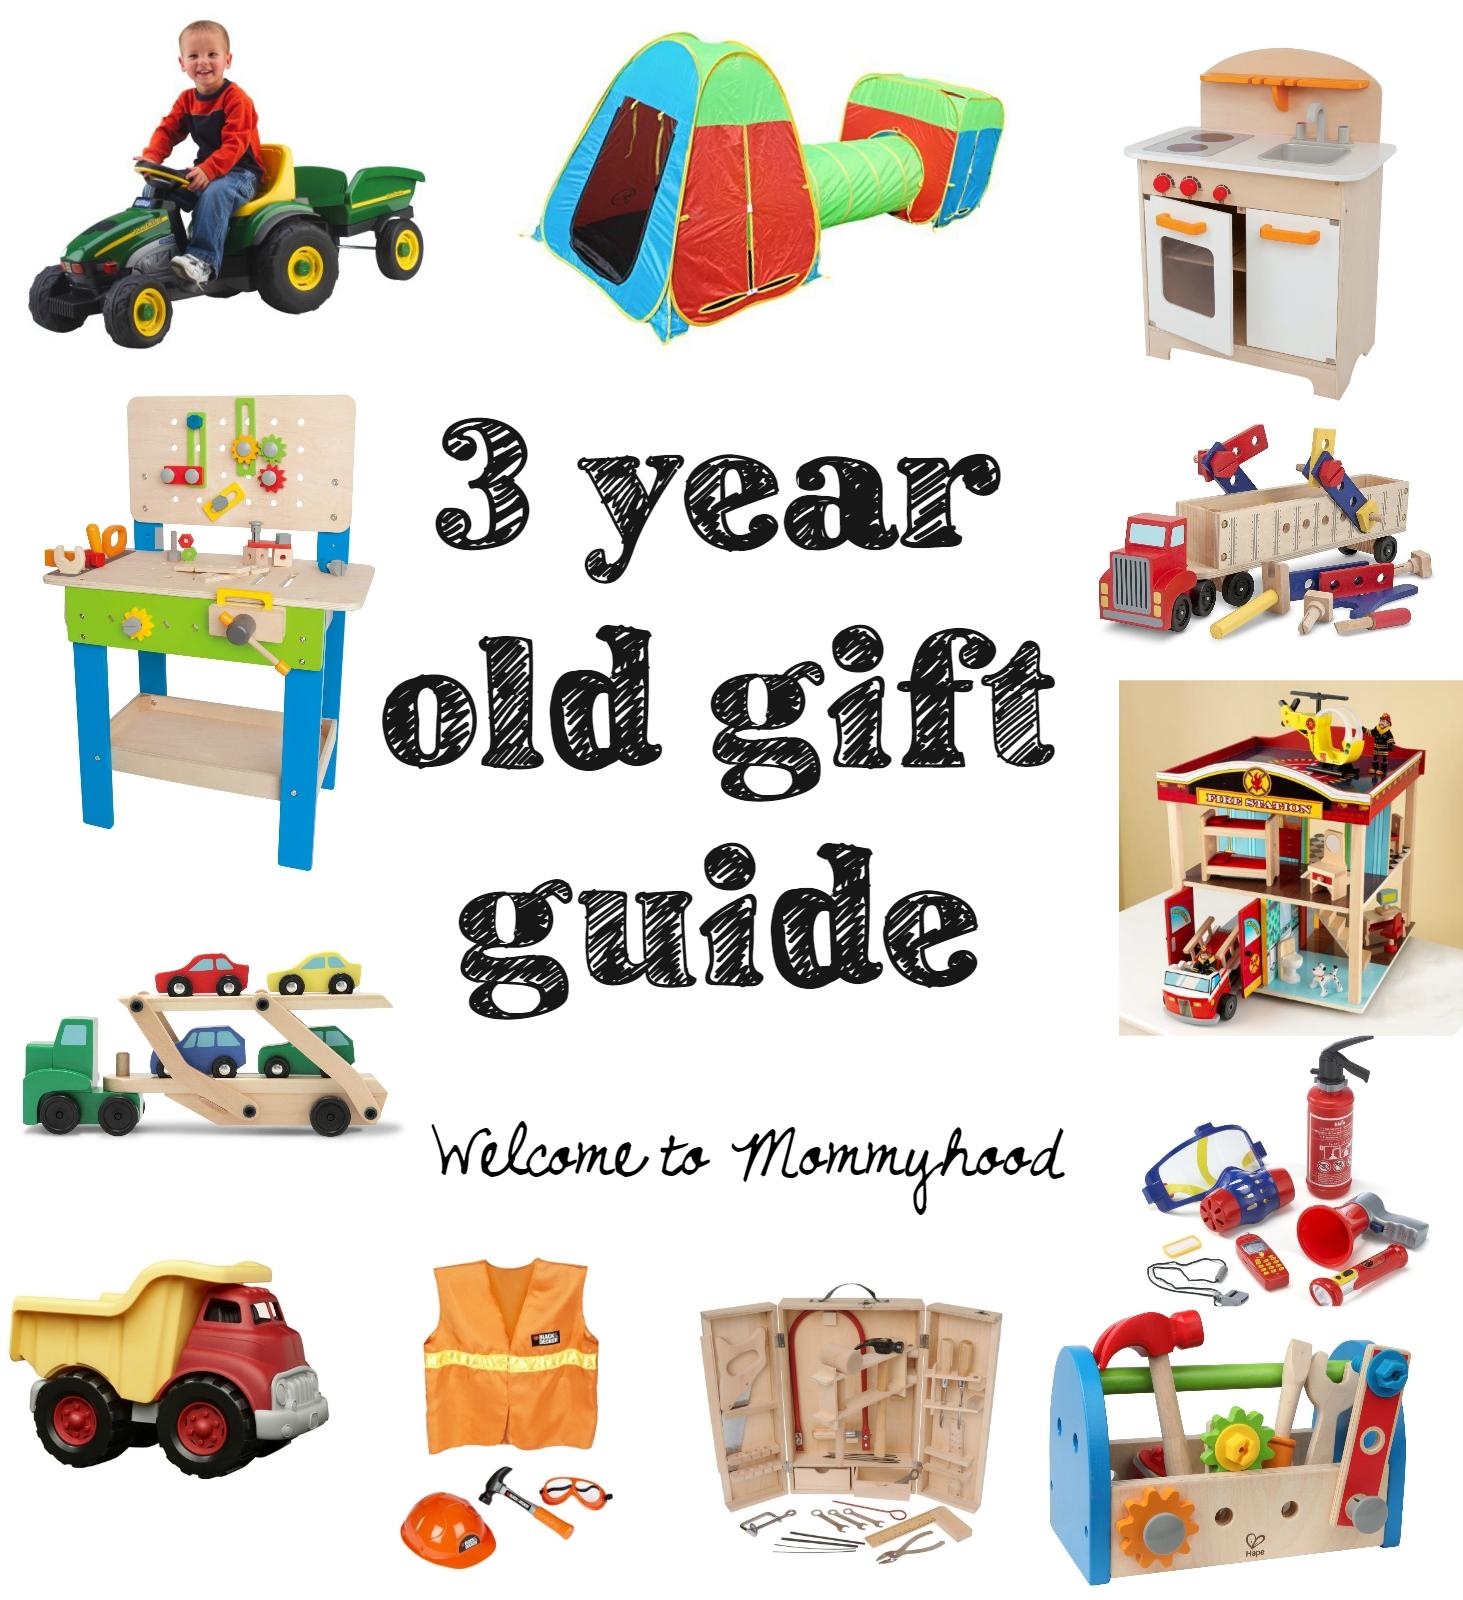 10 Best Ideas For 3 Year Old Birthday birthday gift ideas for a 3 year old third gift and birthdays 1 2020